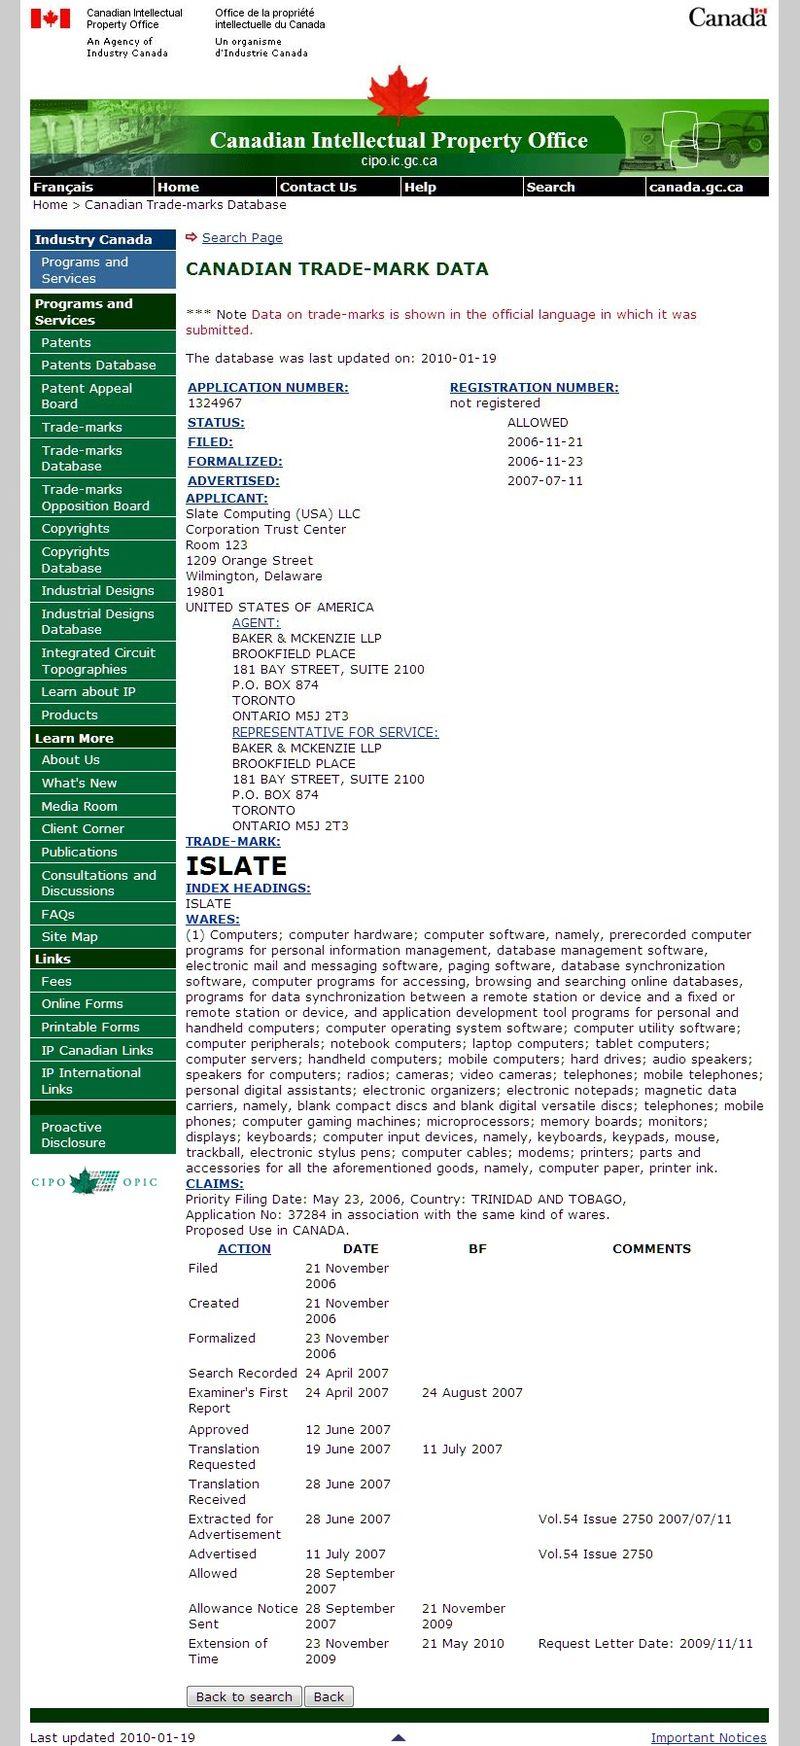 ISLATE, brand considered